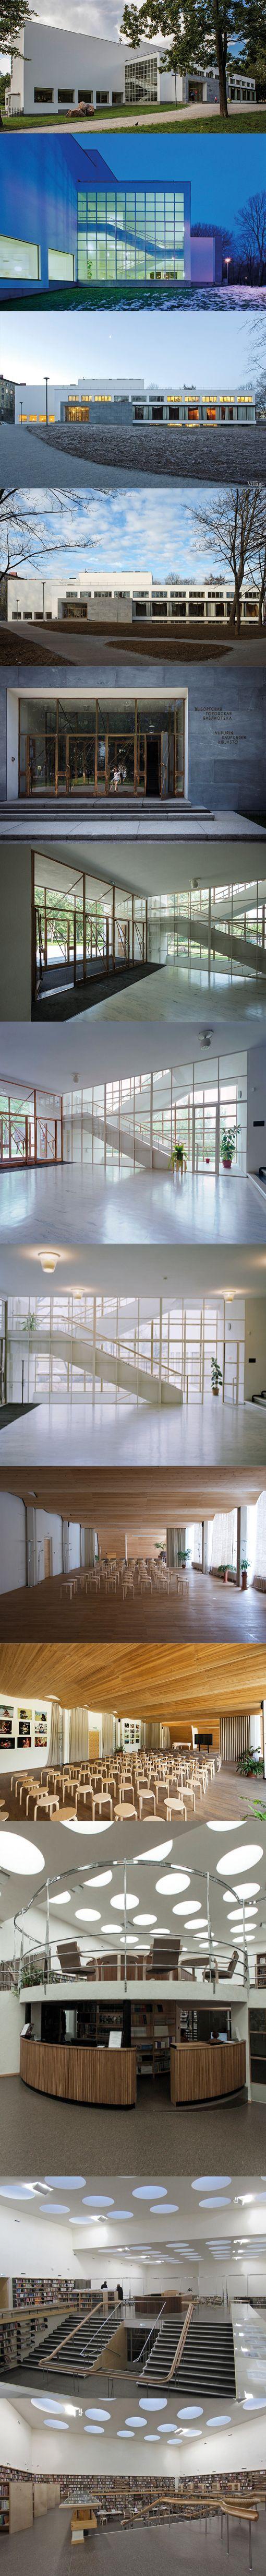 1933-35 Alvar Aalto - Vyborg Library / Russia / Viipuri Finland / concrete glass wood / white / cultural